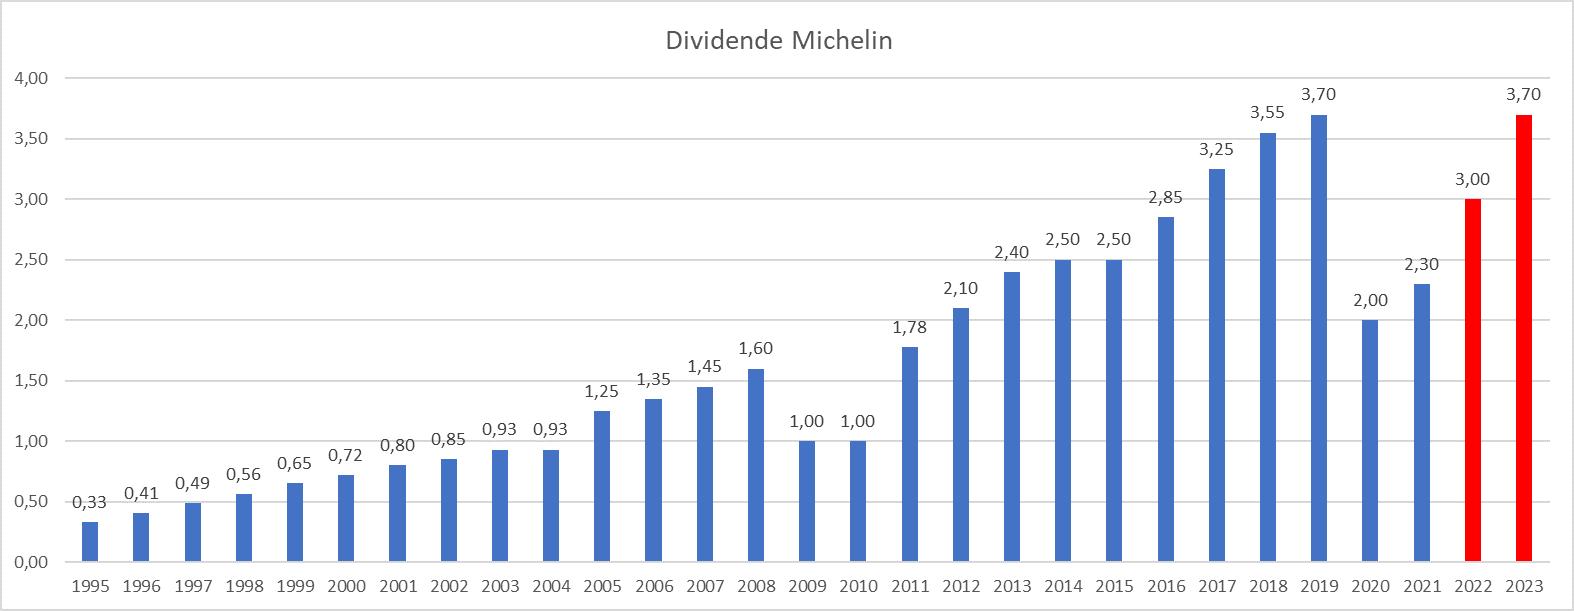 Dividend Aristocrats France Michelin